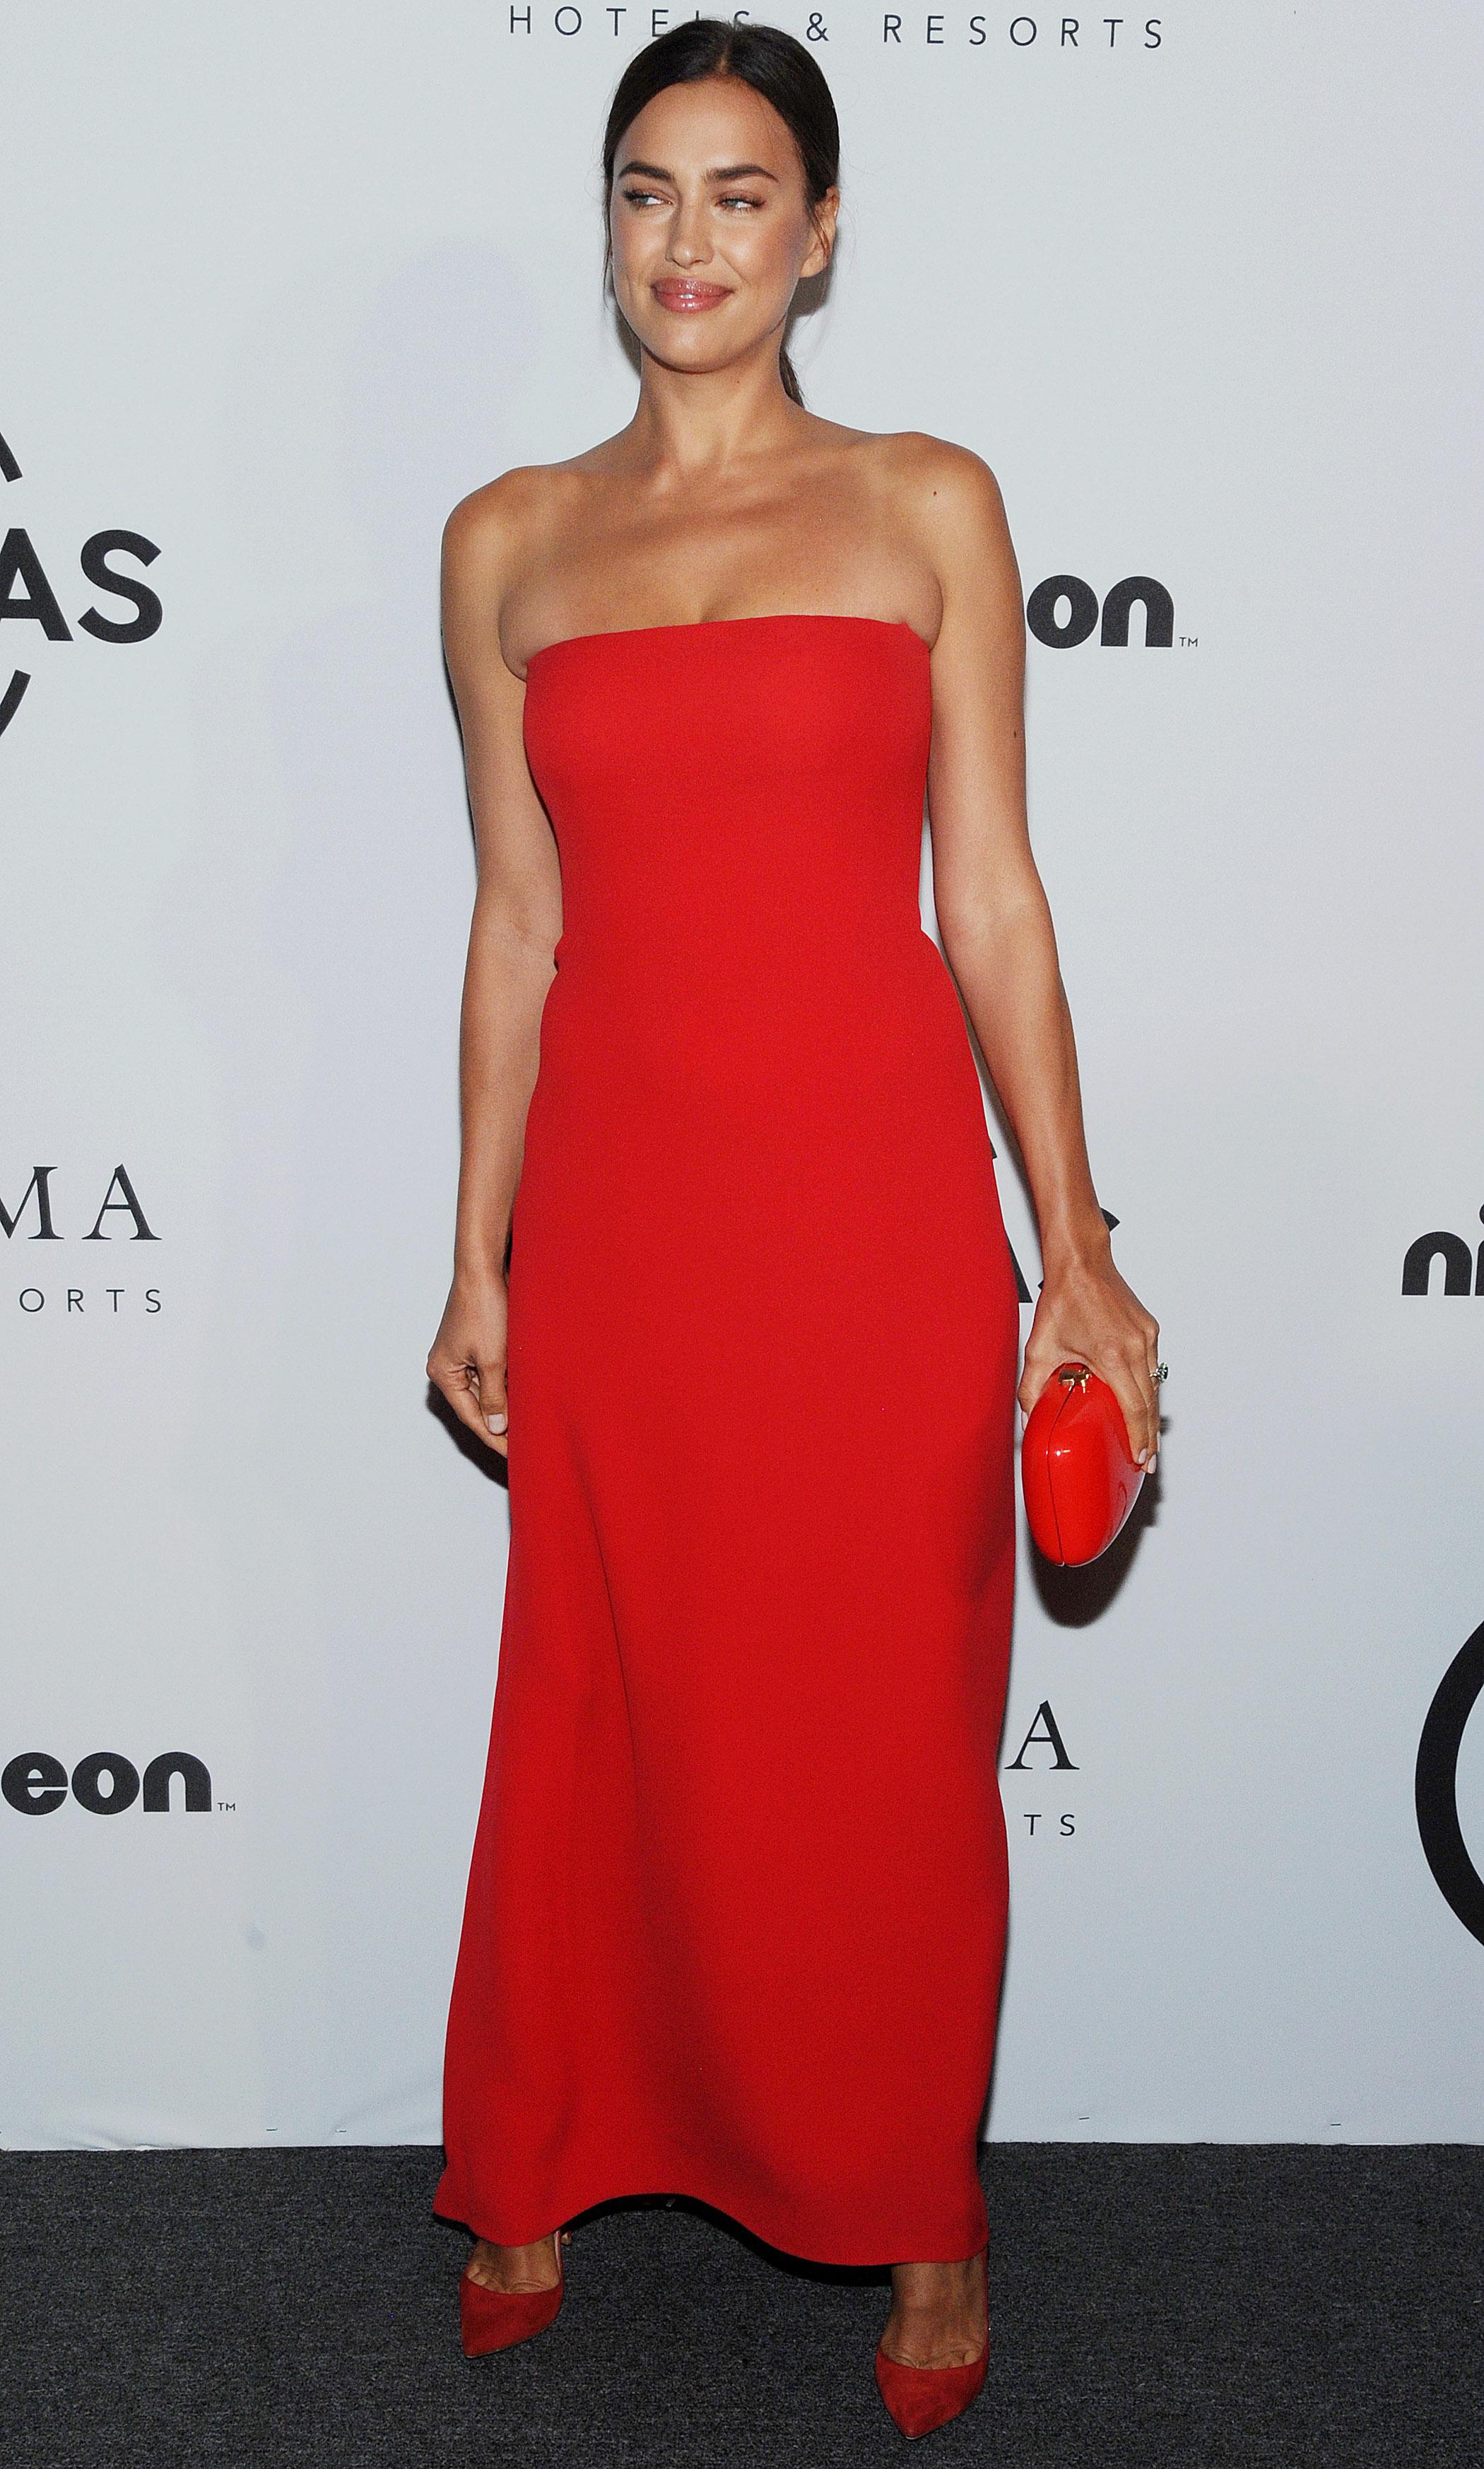 Irina Shayk Vestido Rojo Natasha Poly